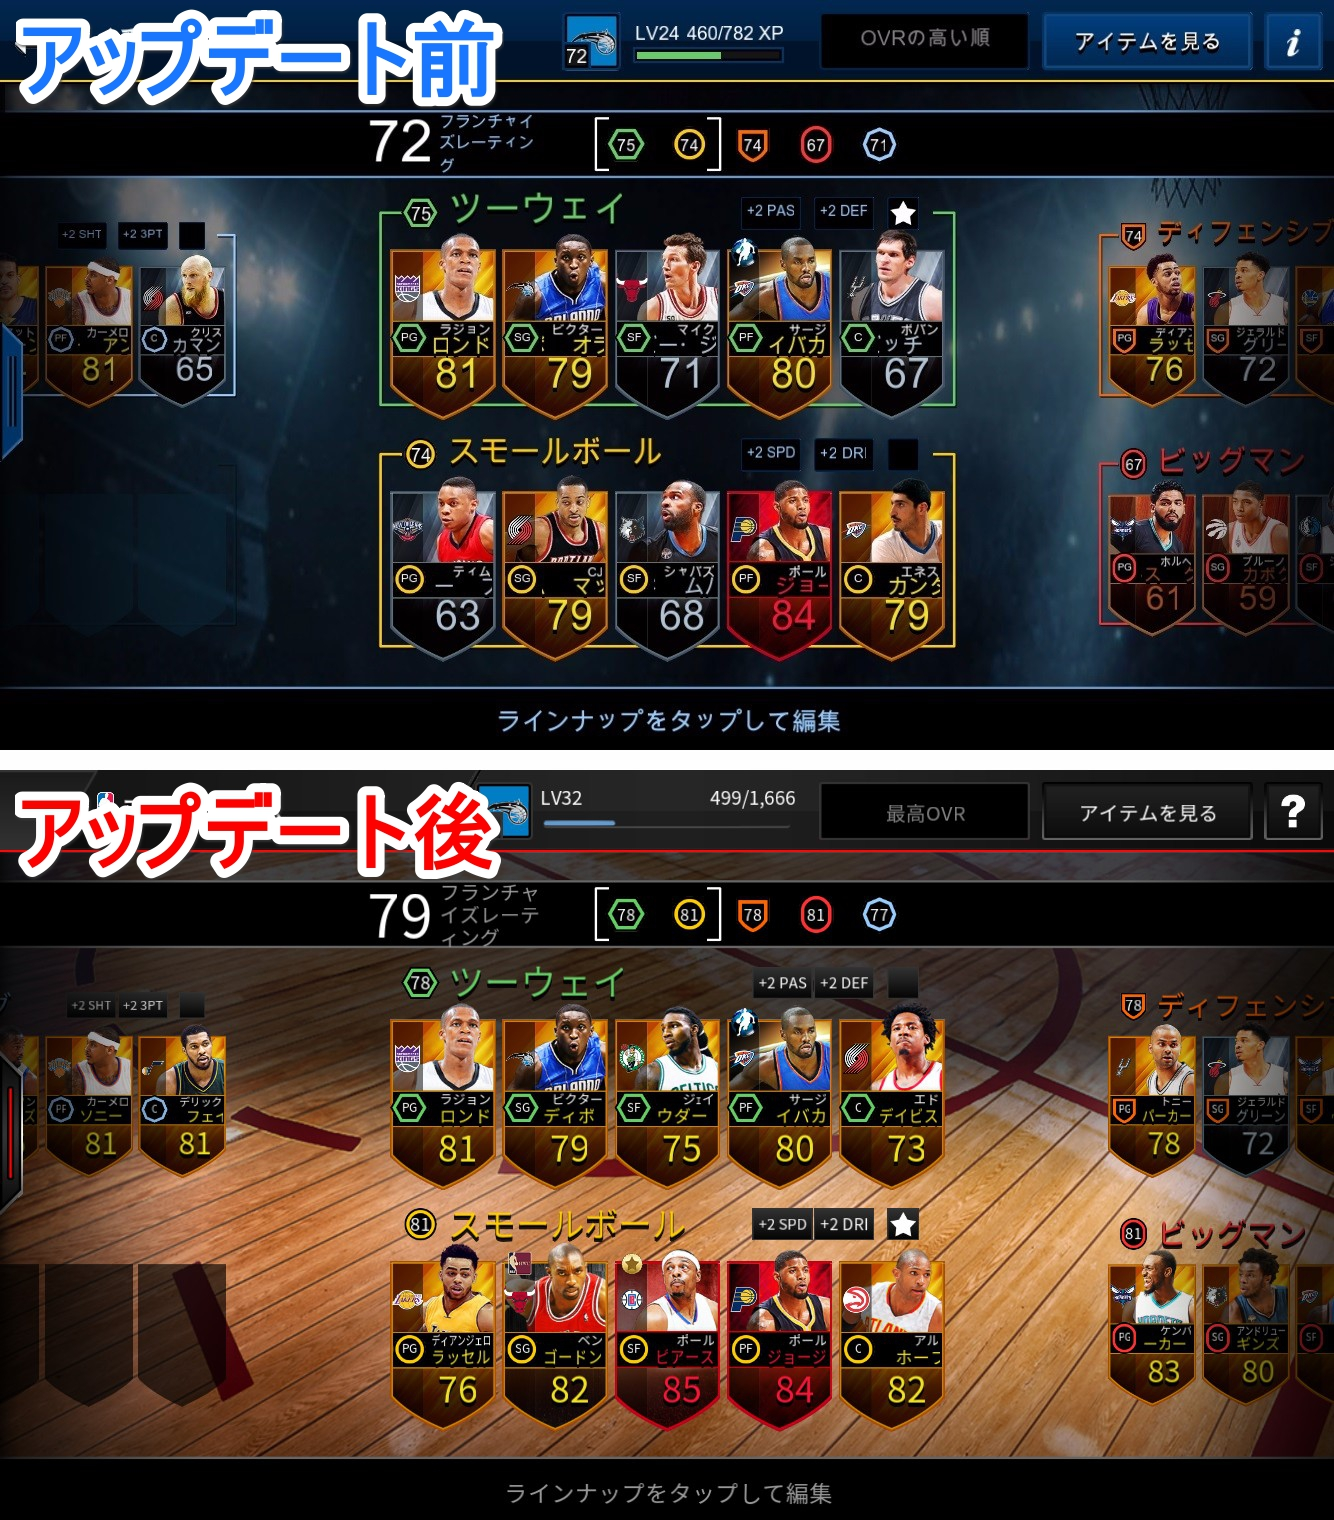 NBA LIVE Mobile【攻略】: アリウープのやり方伝授!大型アップデートでの注目点と変更点